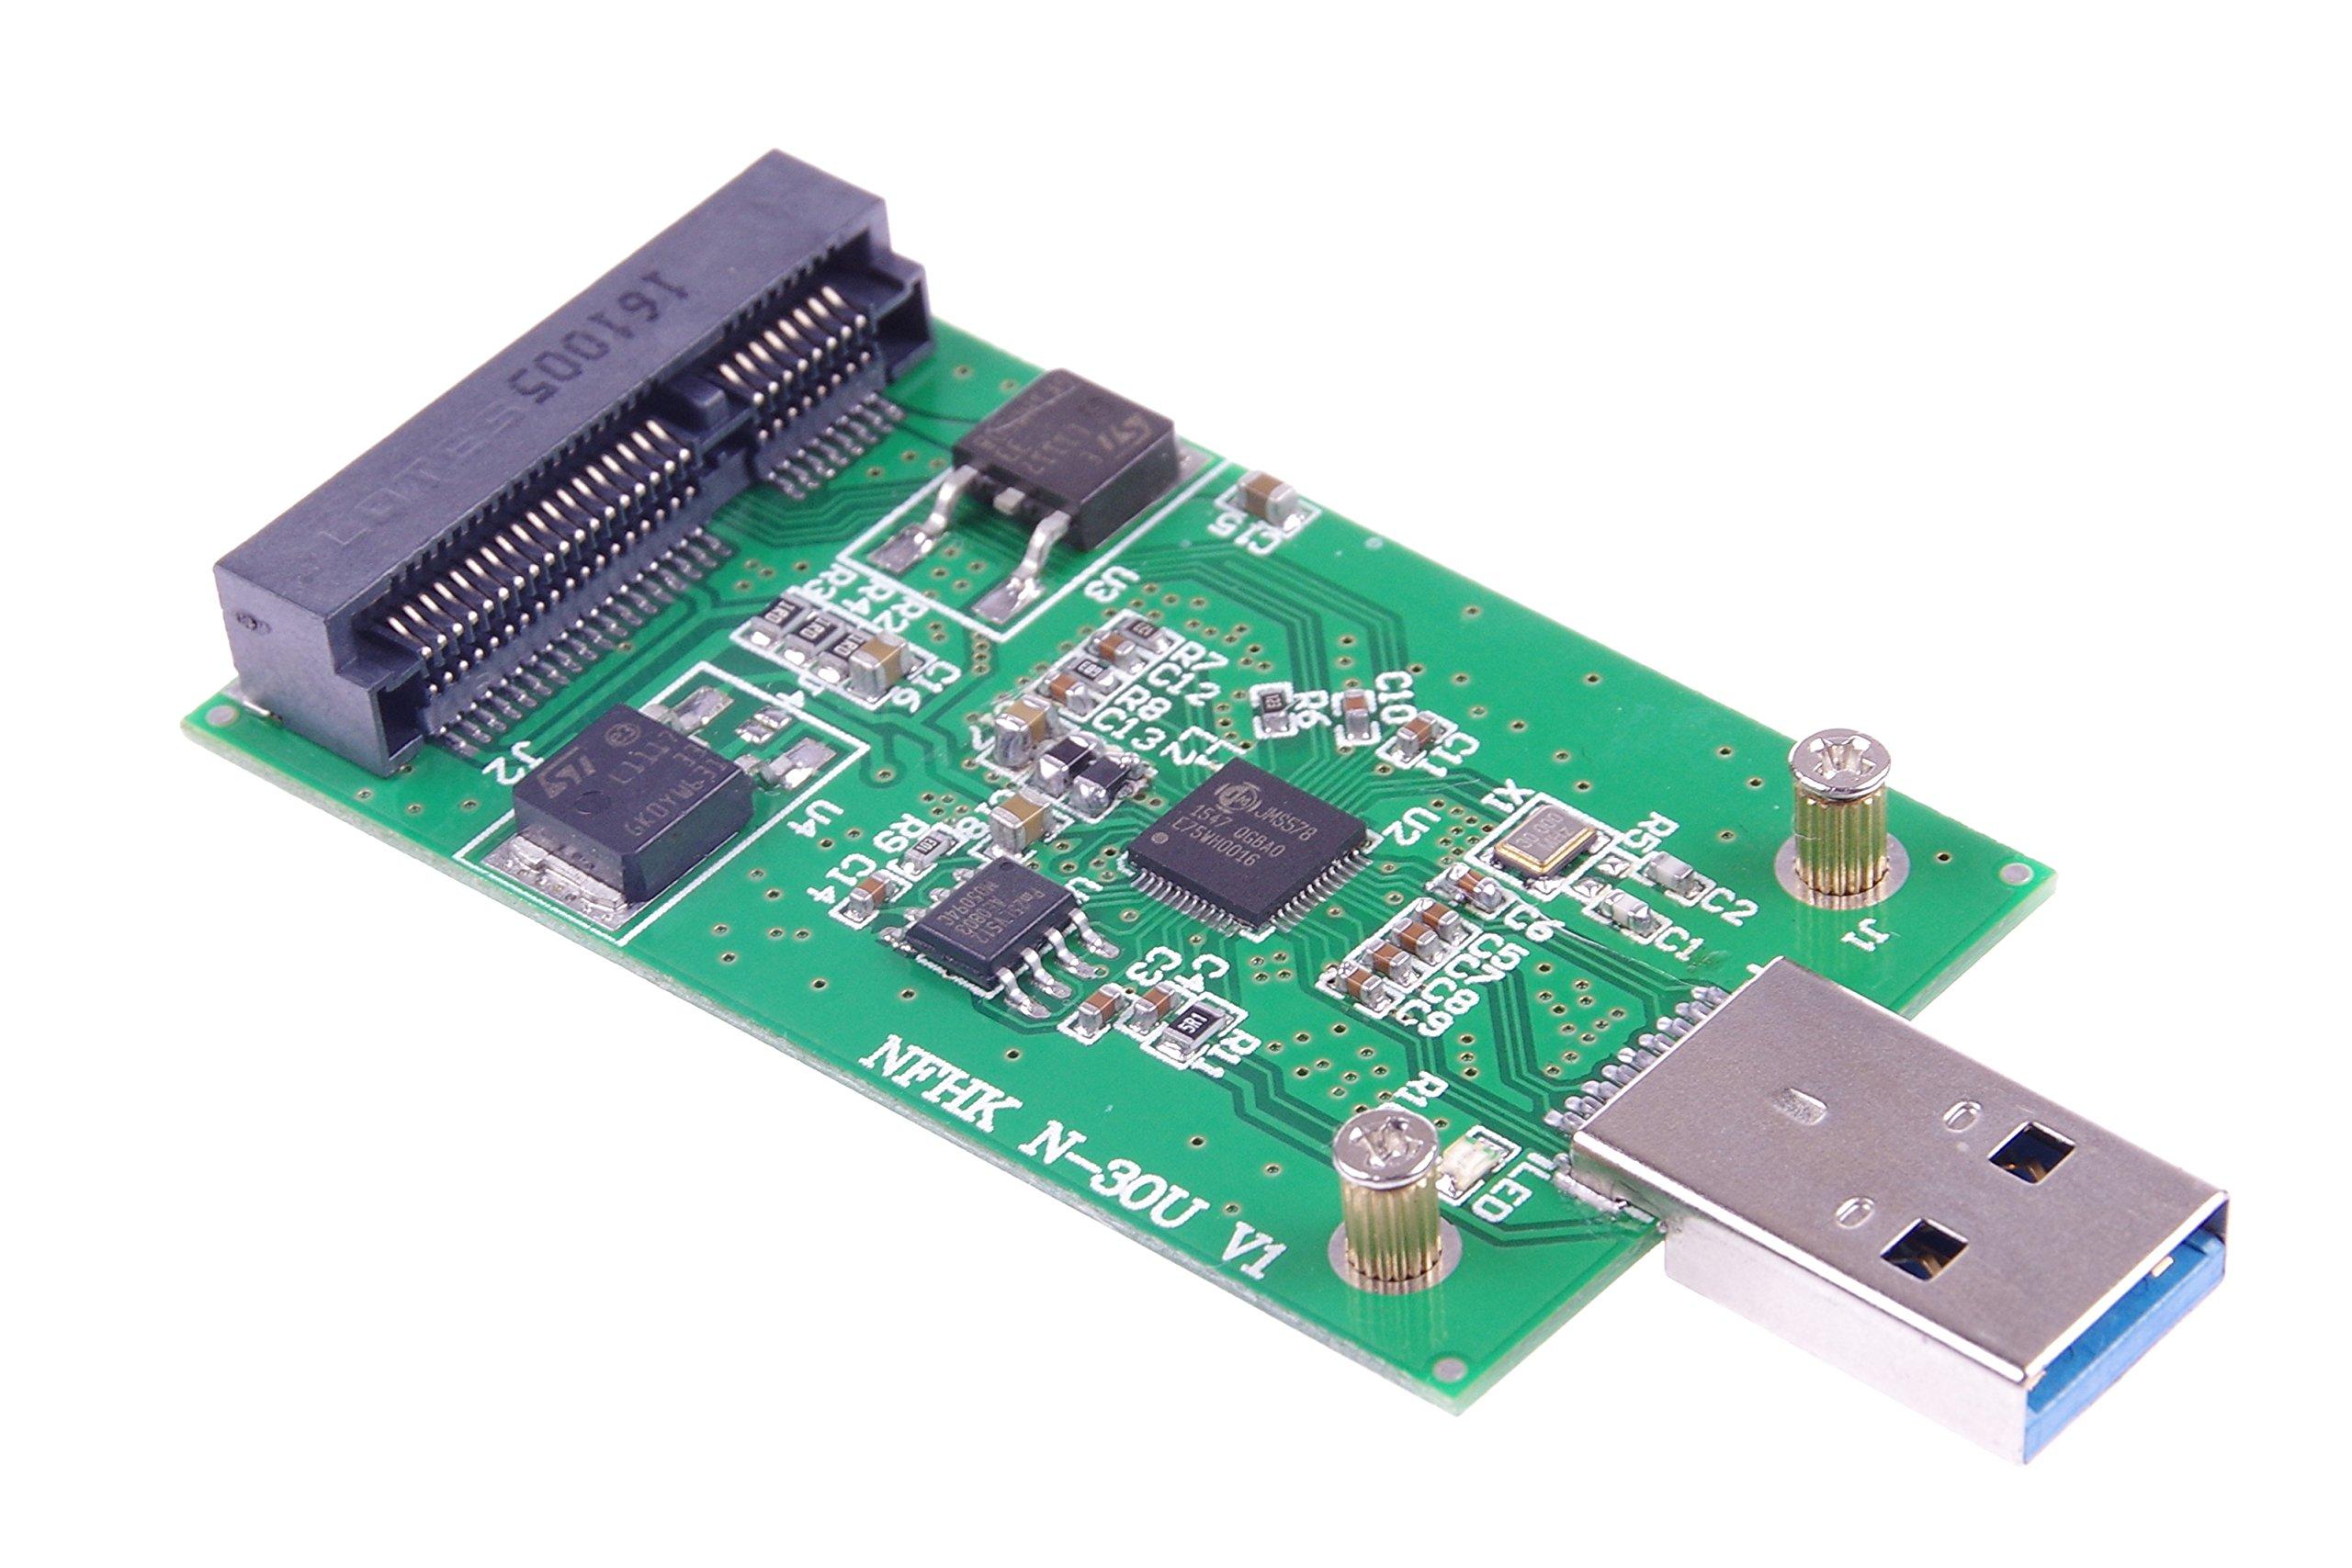 KNACRO USB 3.0 mSATA SSD Adapter as USB Disk Driver don't need USB cable USB 3.0 to mSATA SSD adapter card